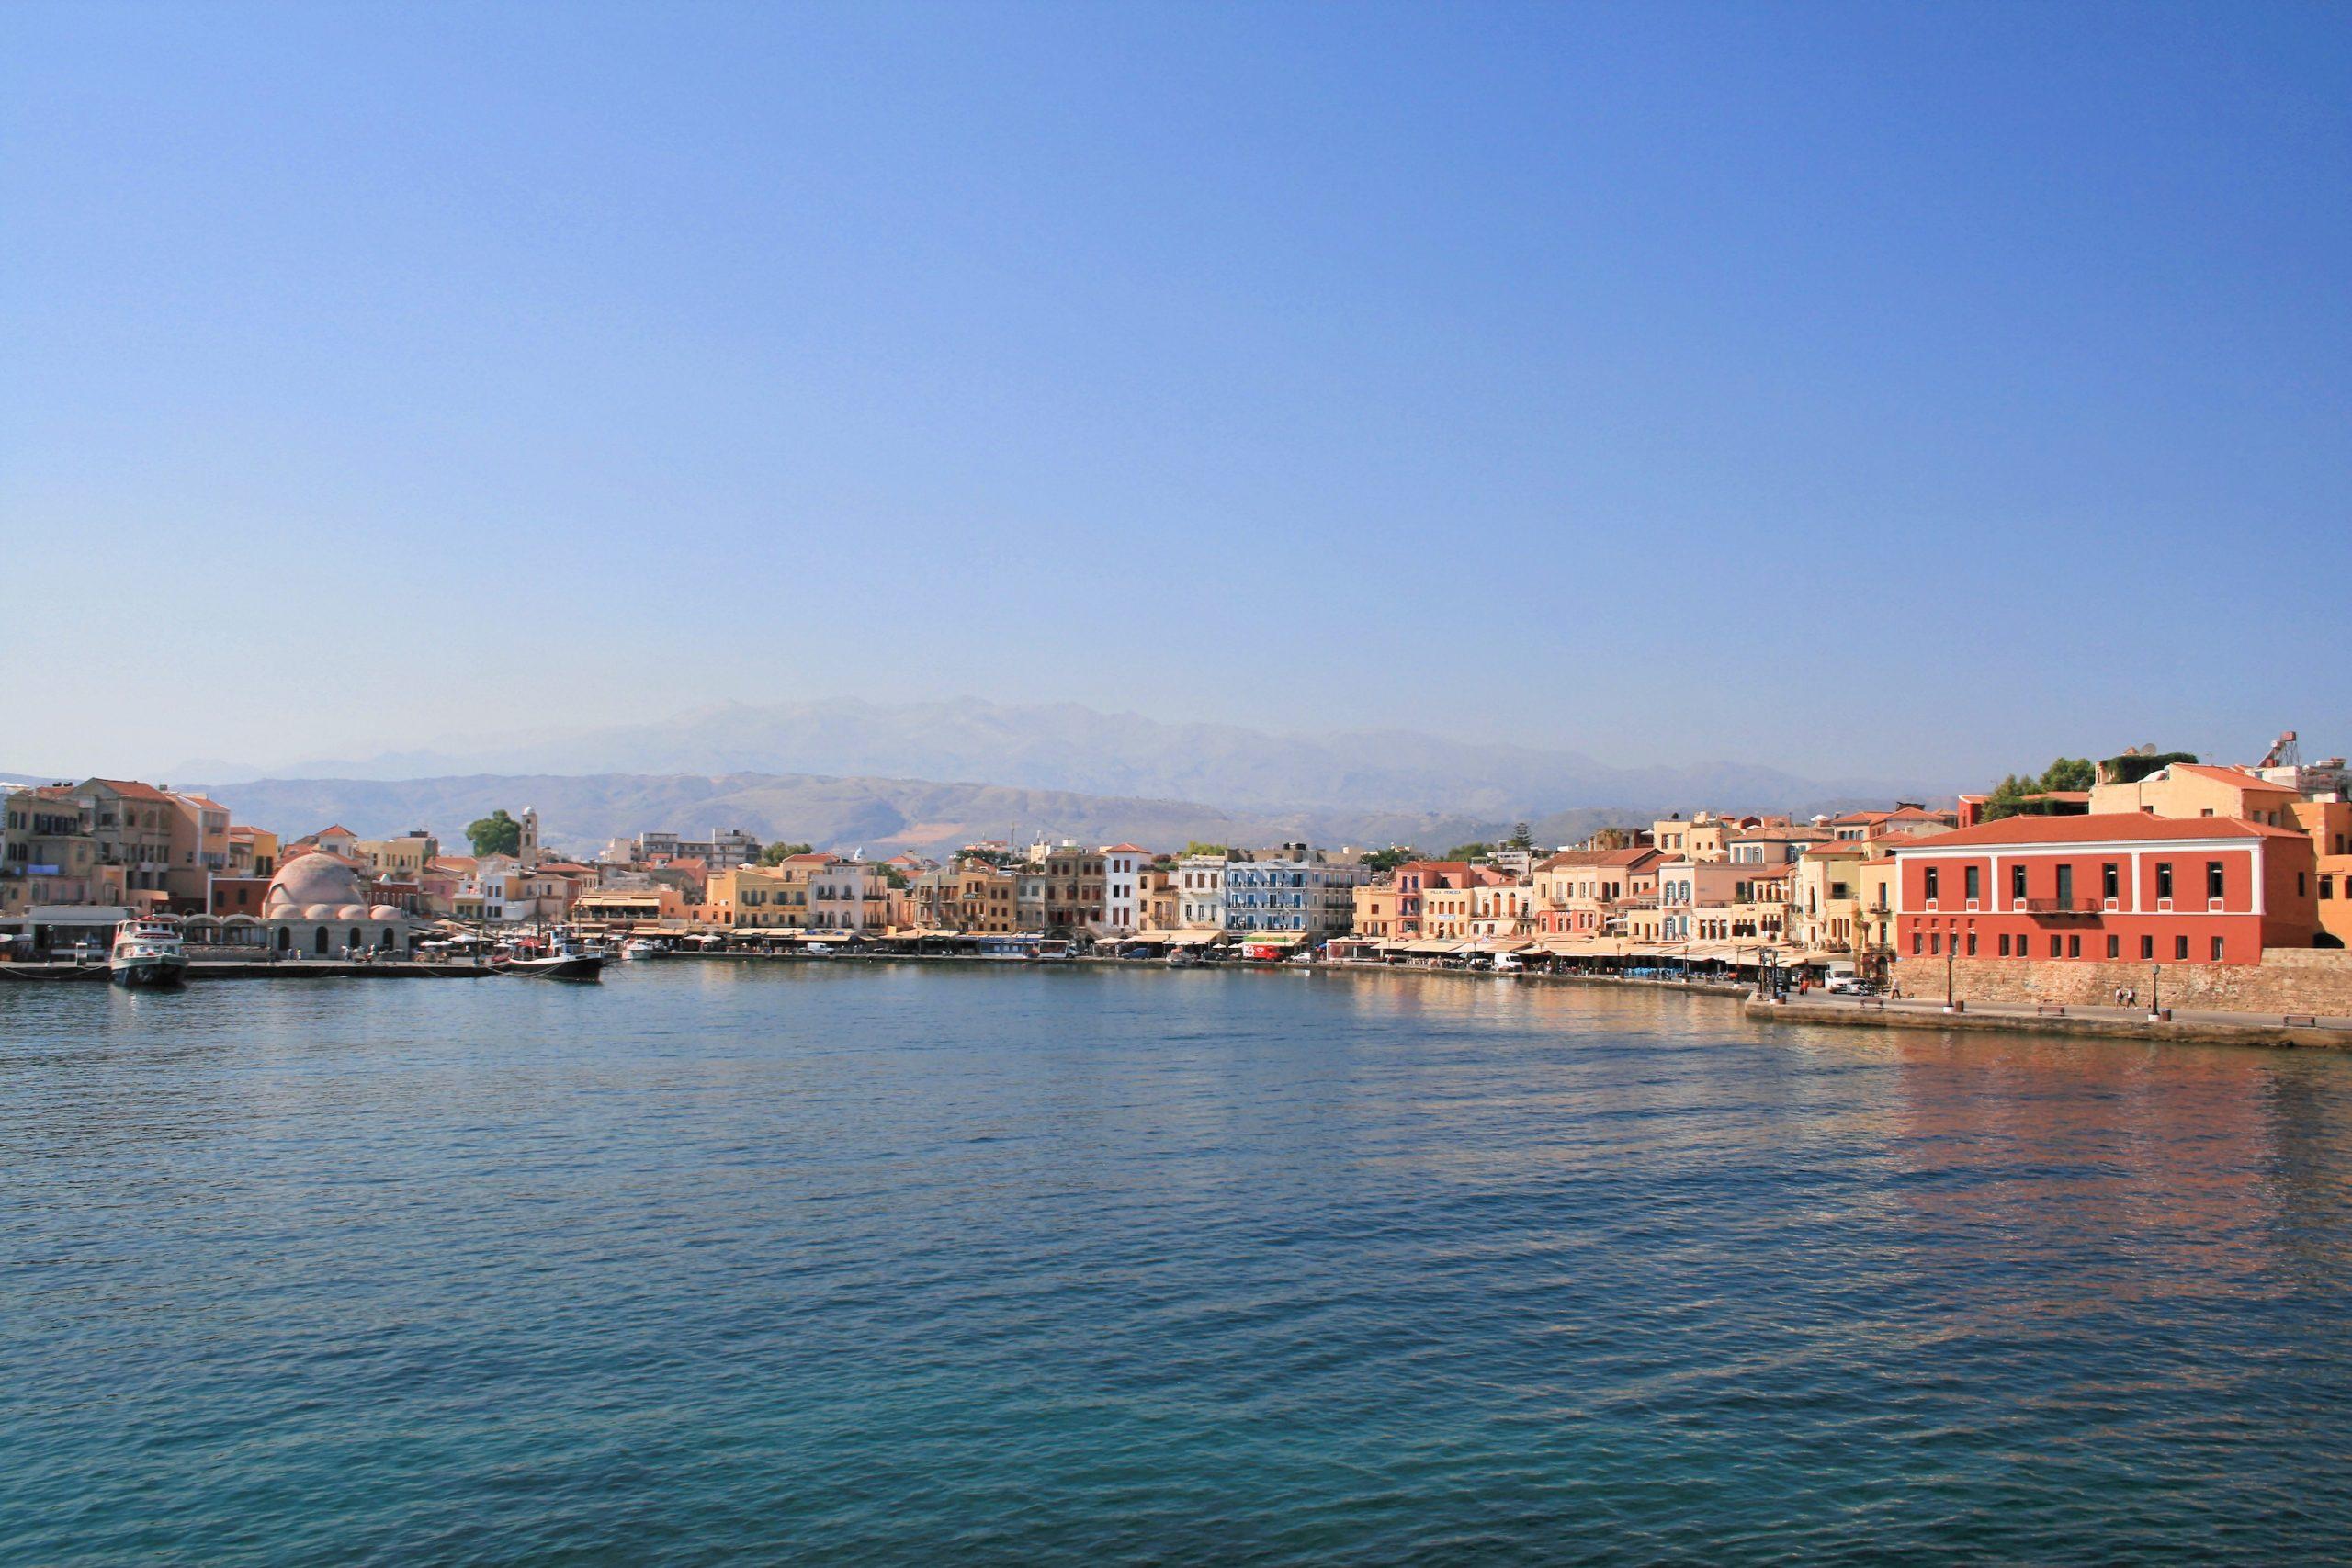 Best Tourist Place To Visit in Crete Islands-Chania's Venetian Harbor